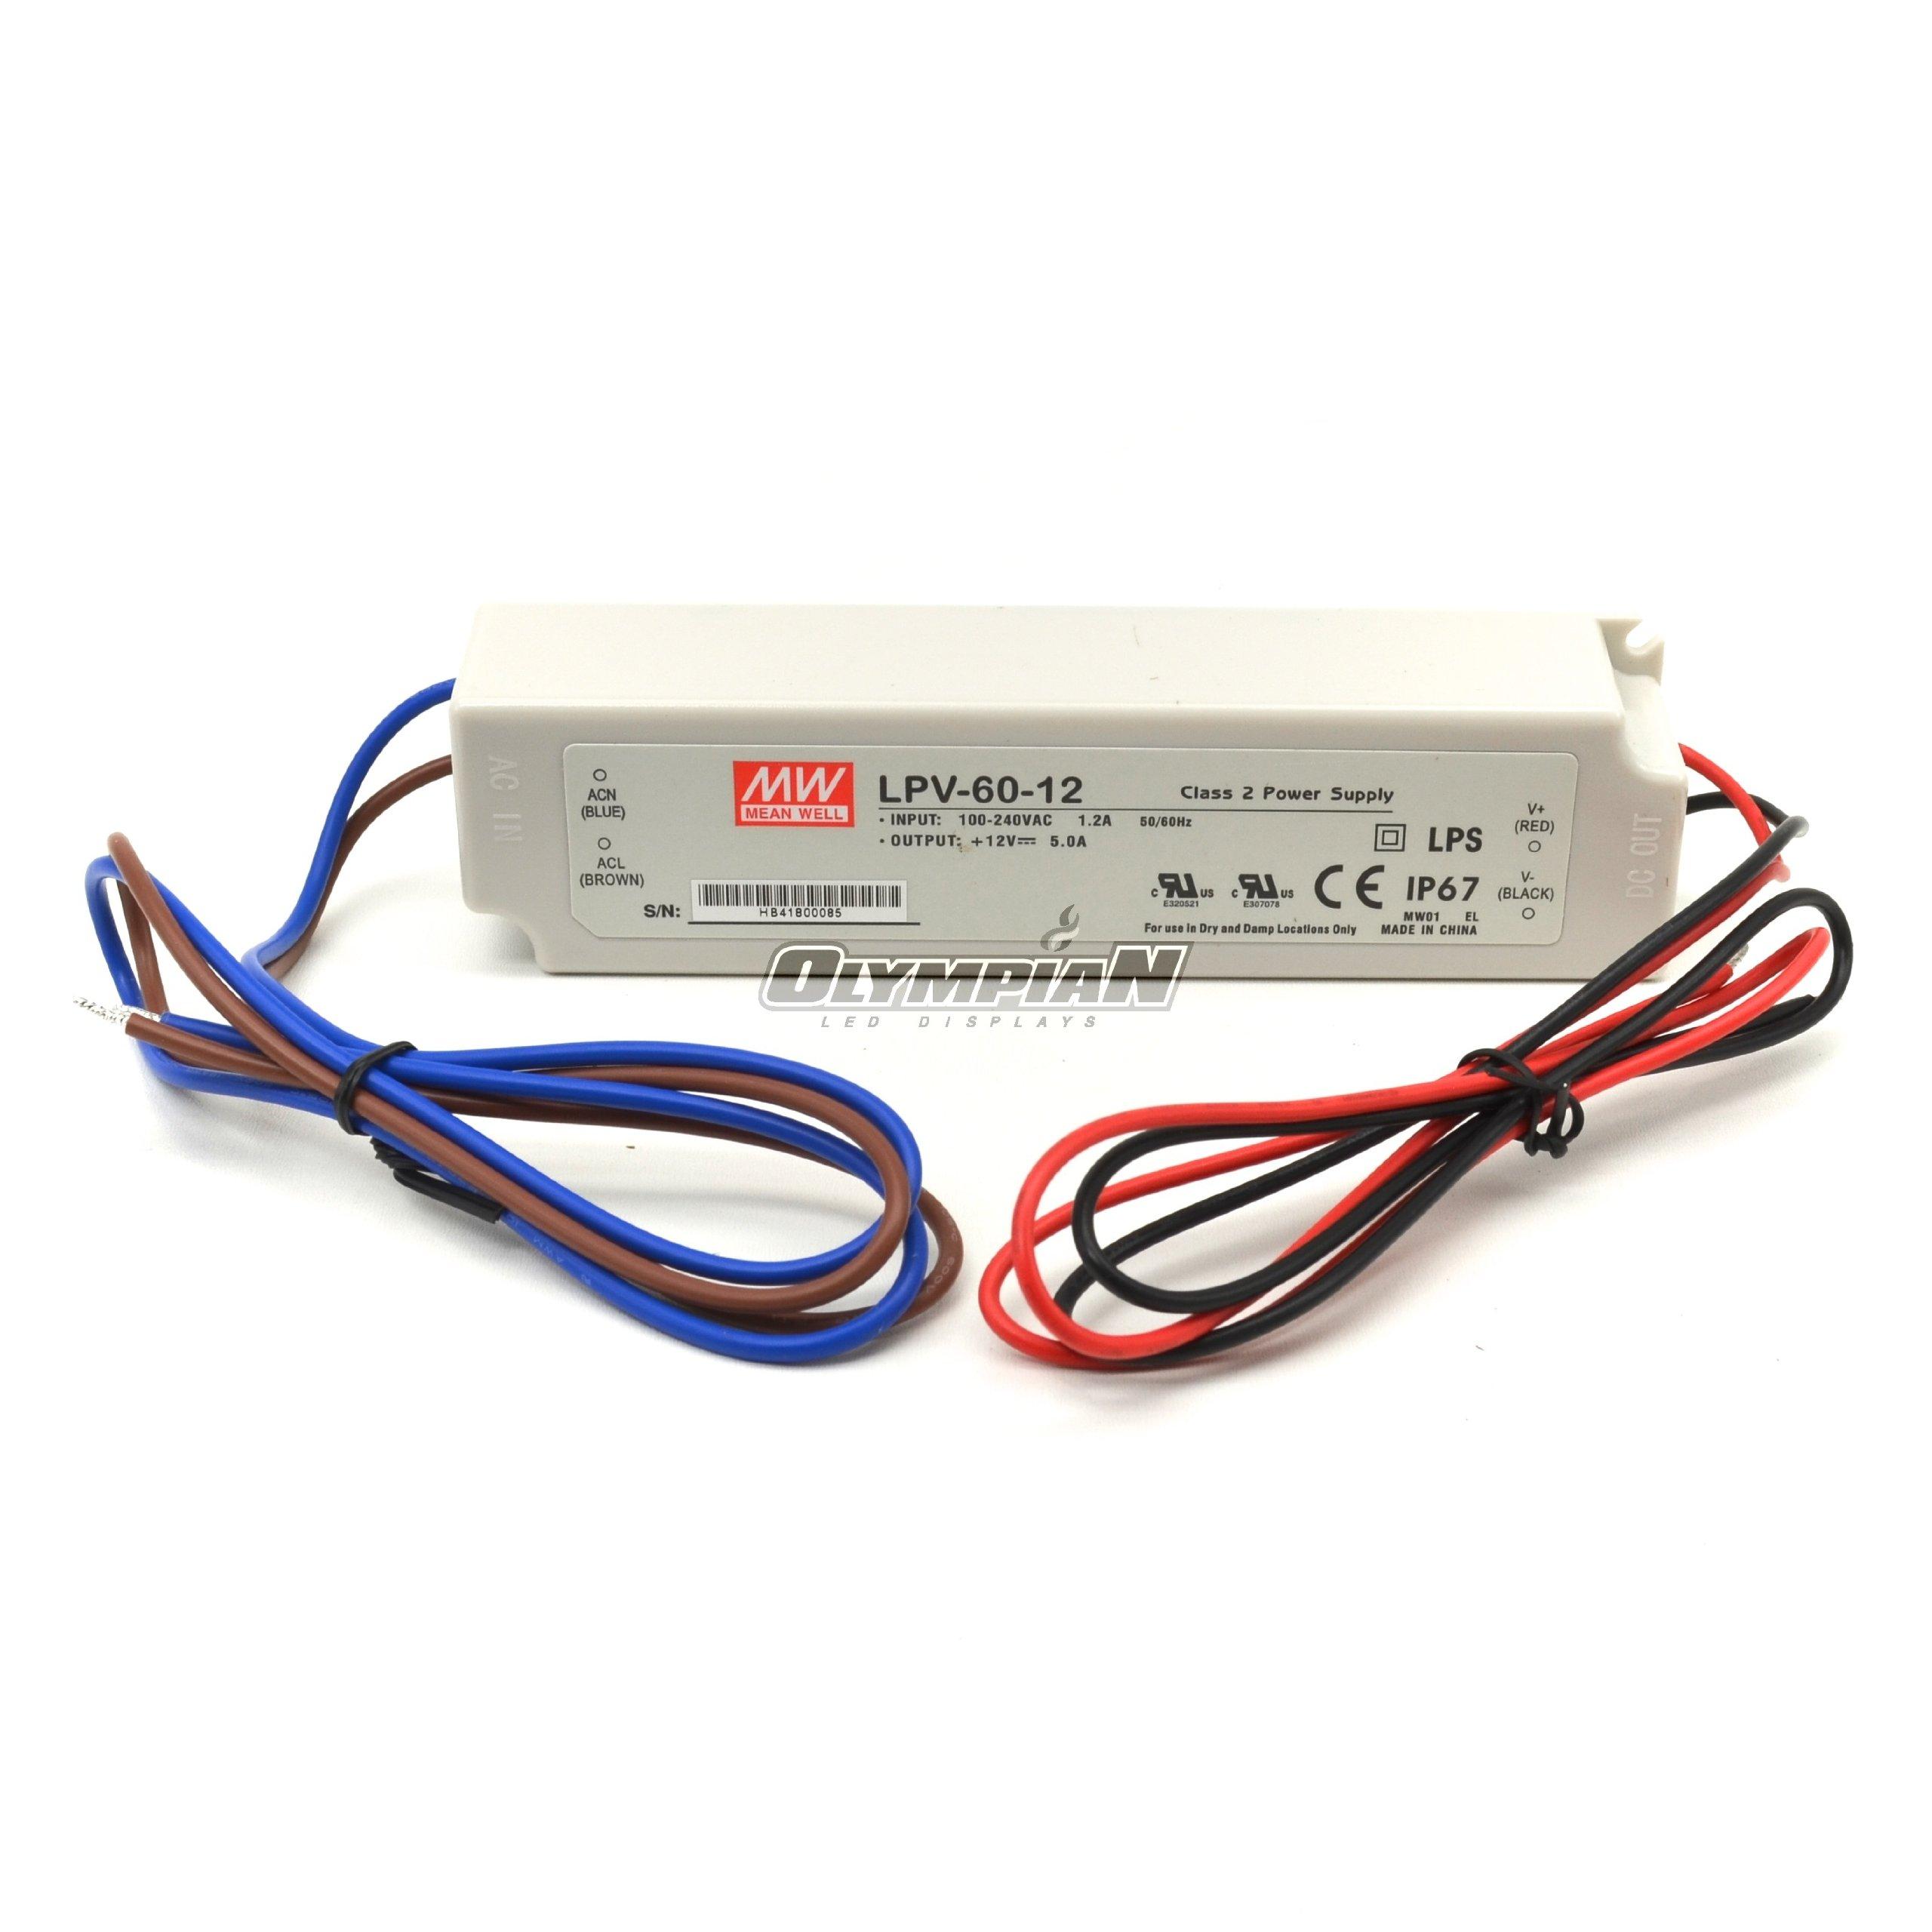 MEAN WELL LPV-60-24 LED DRIVER, AC-DC, CV, 24V, 60W